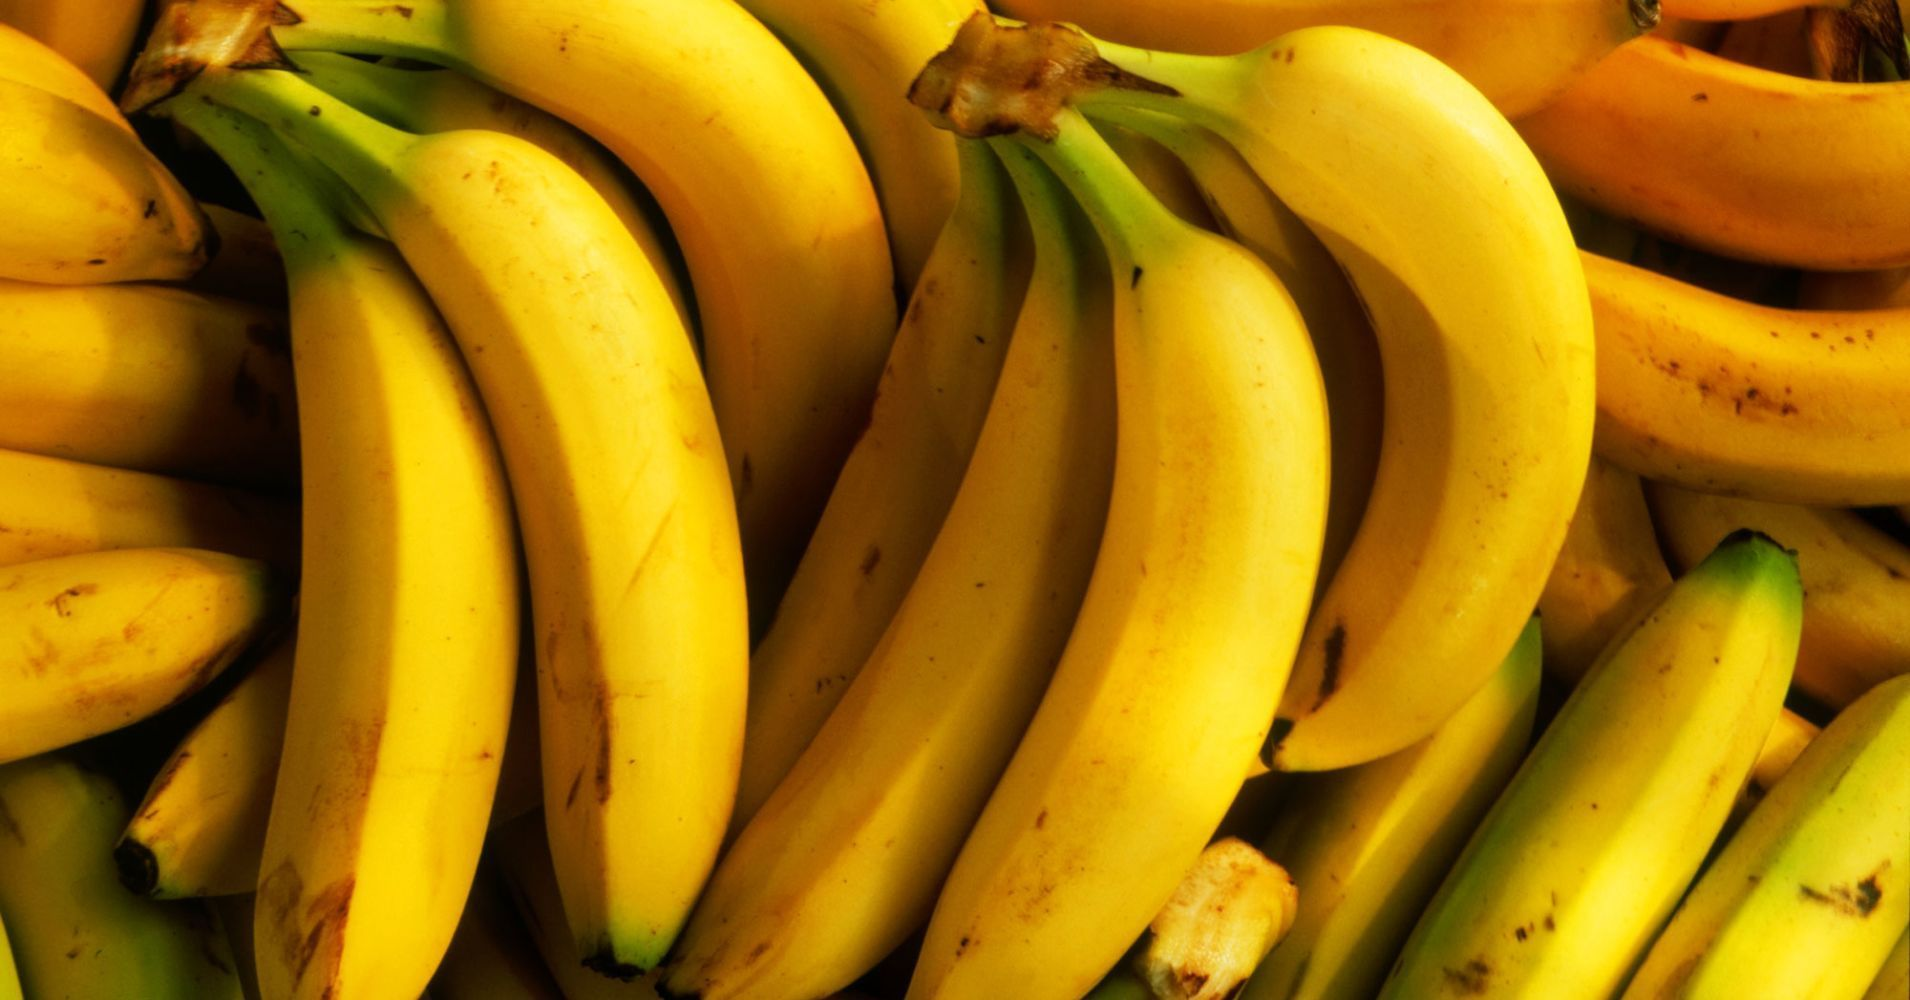 America's favorite fruit could go extinct Fruit, Banana